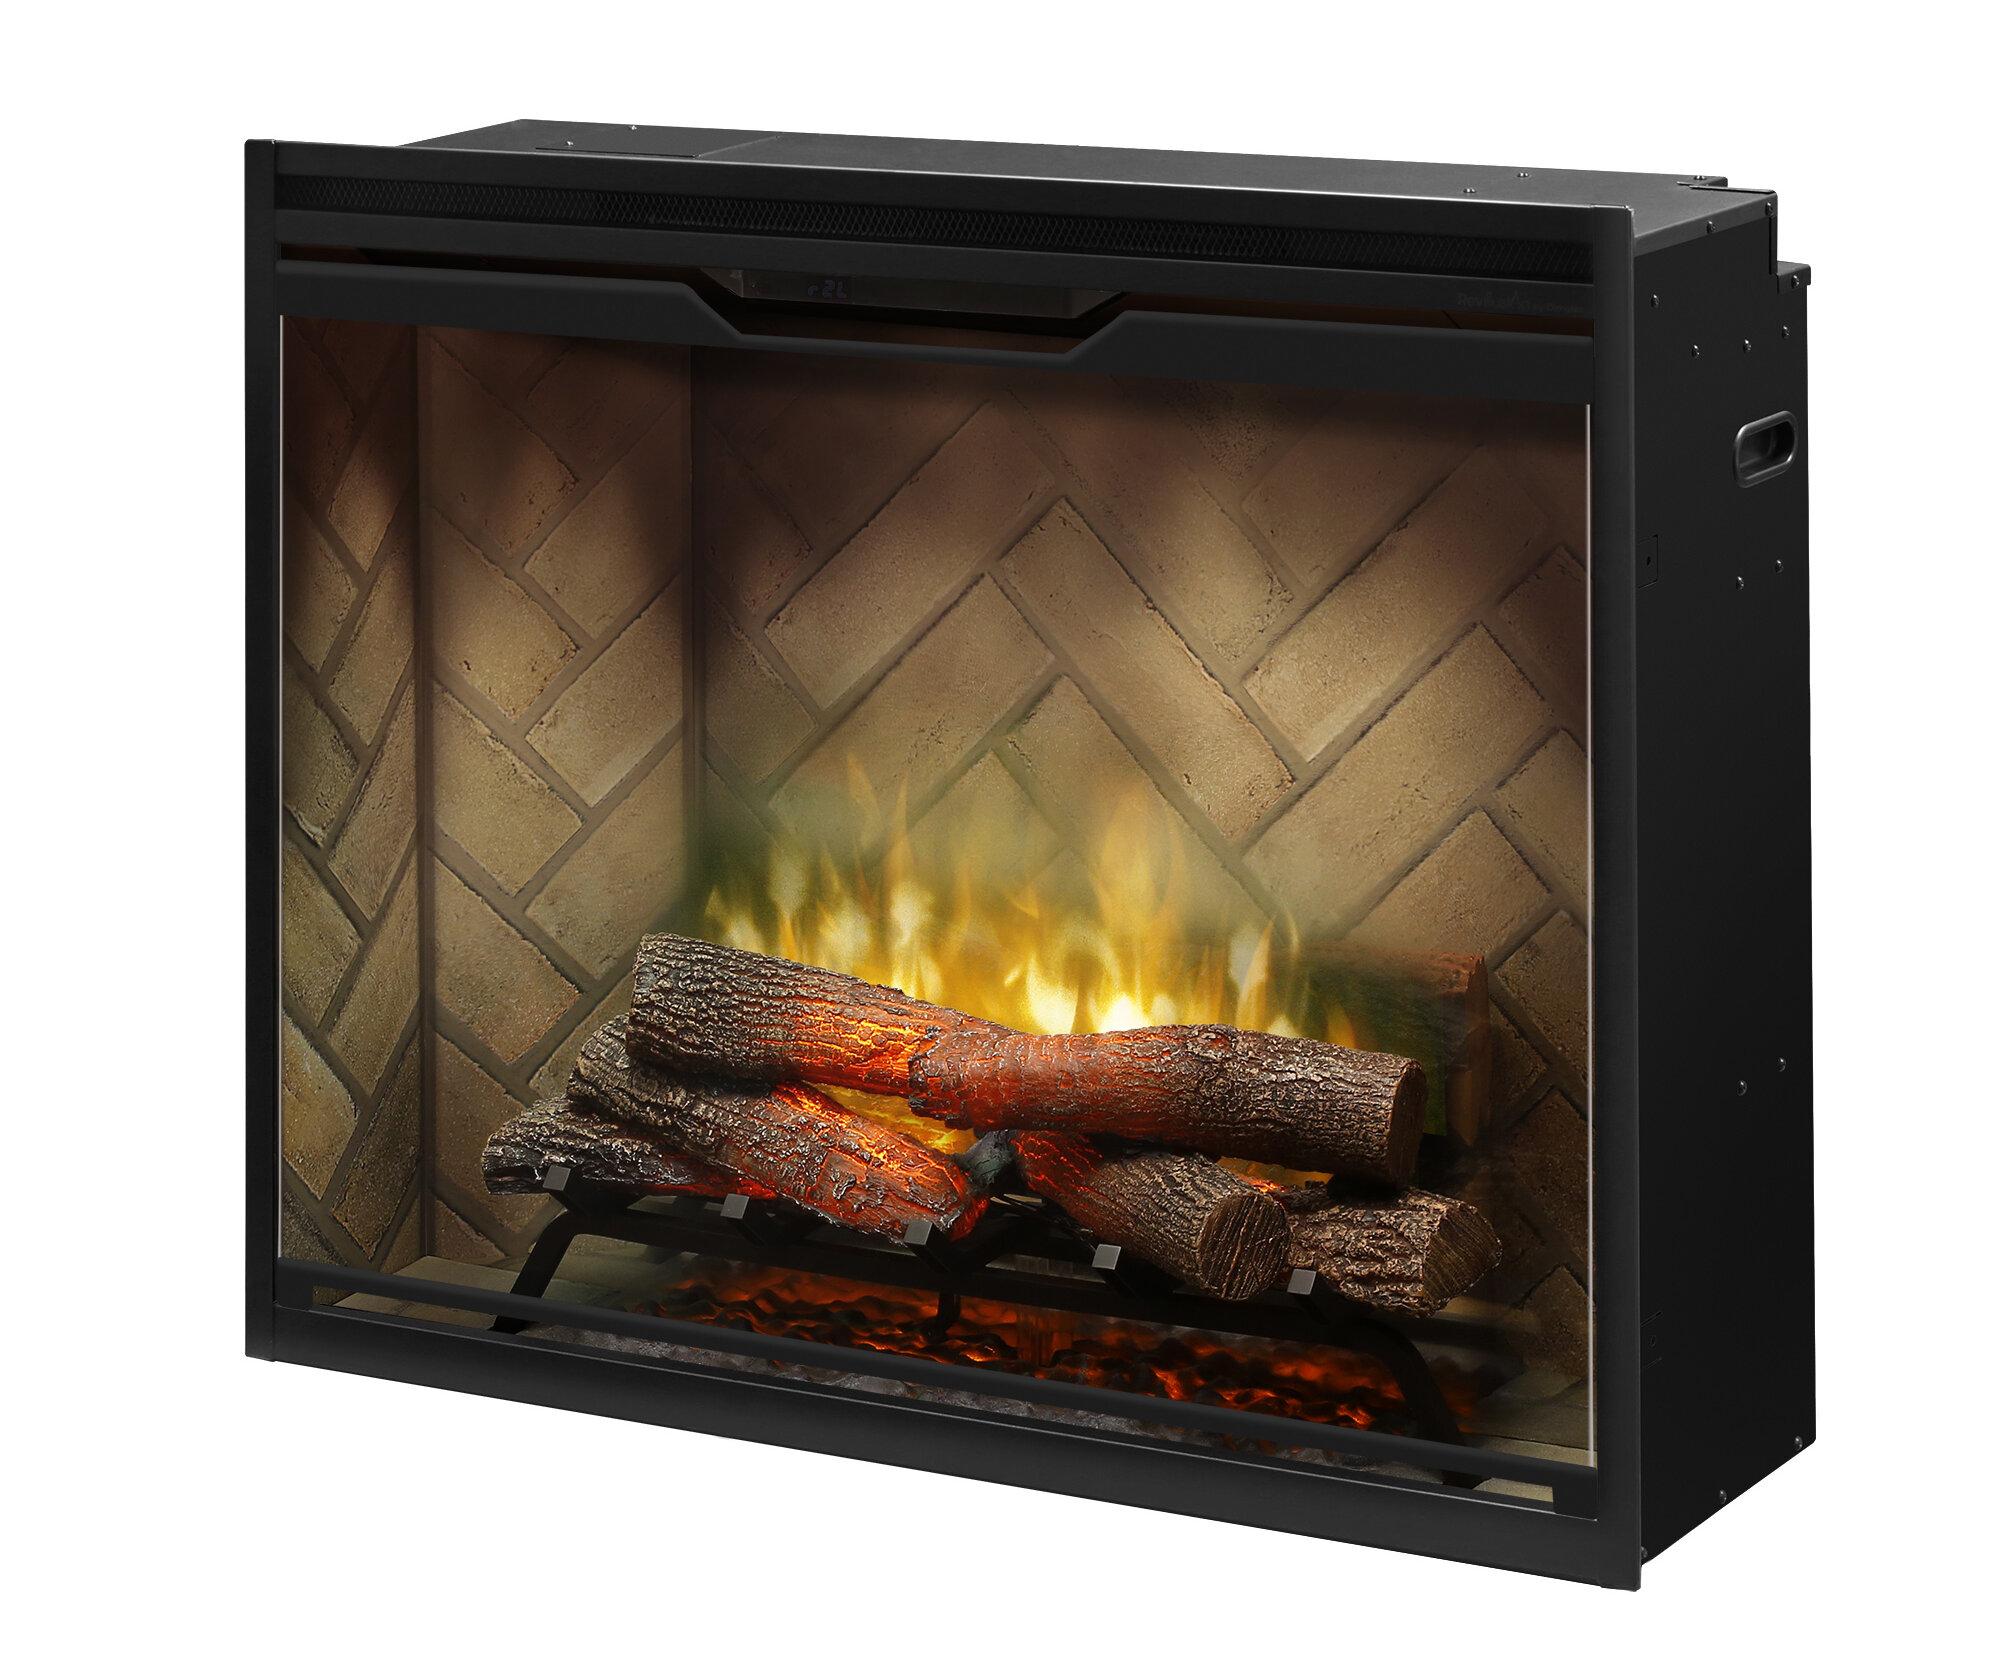 Dimplex Revillusion Electric Fireplace Insert